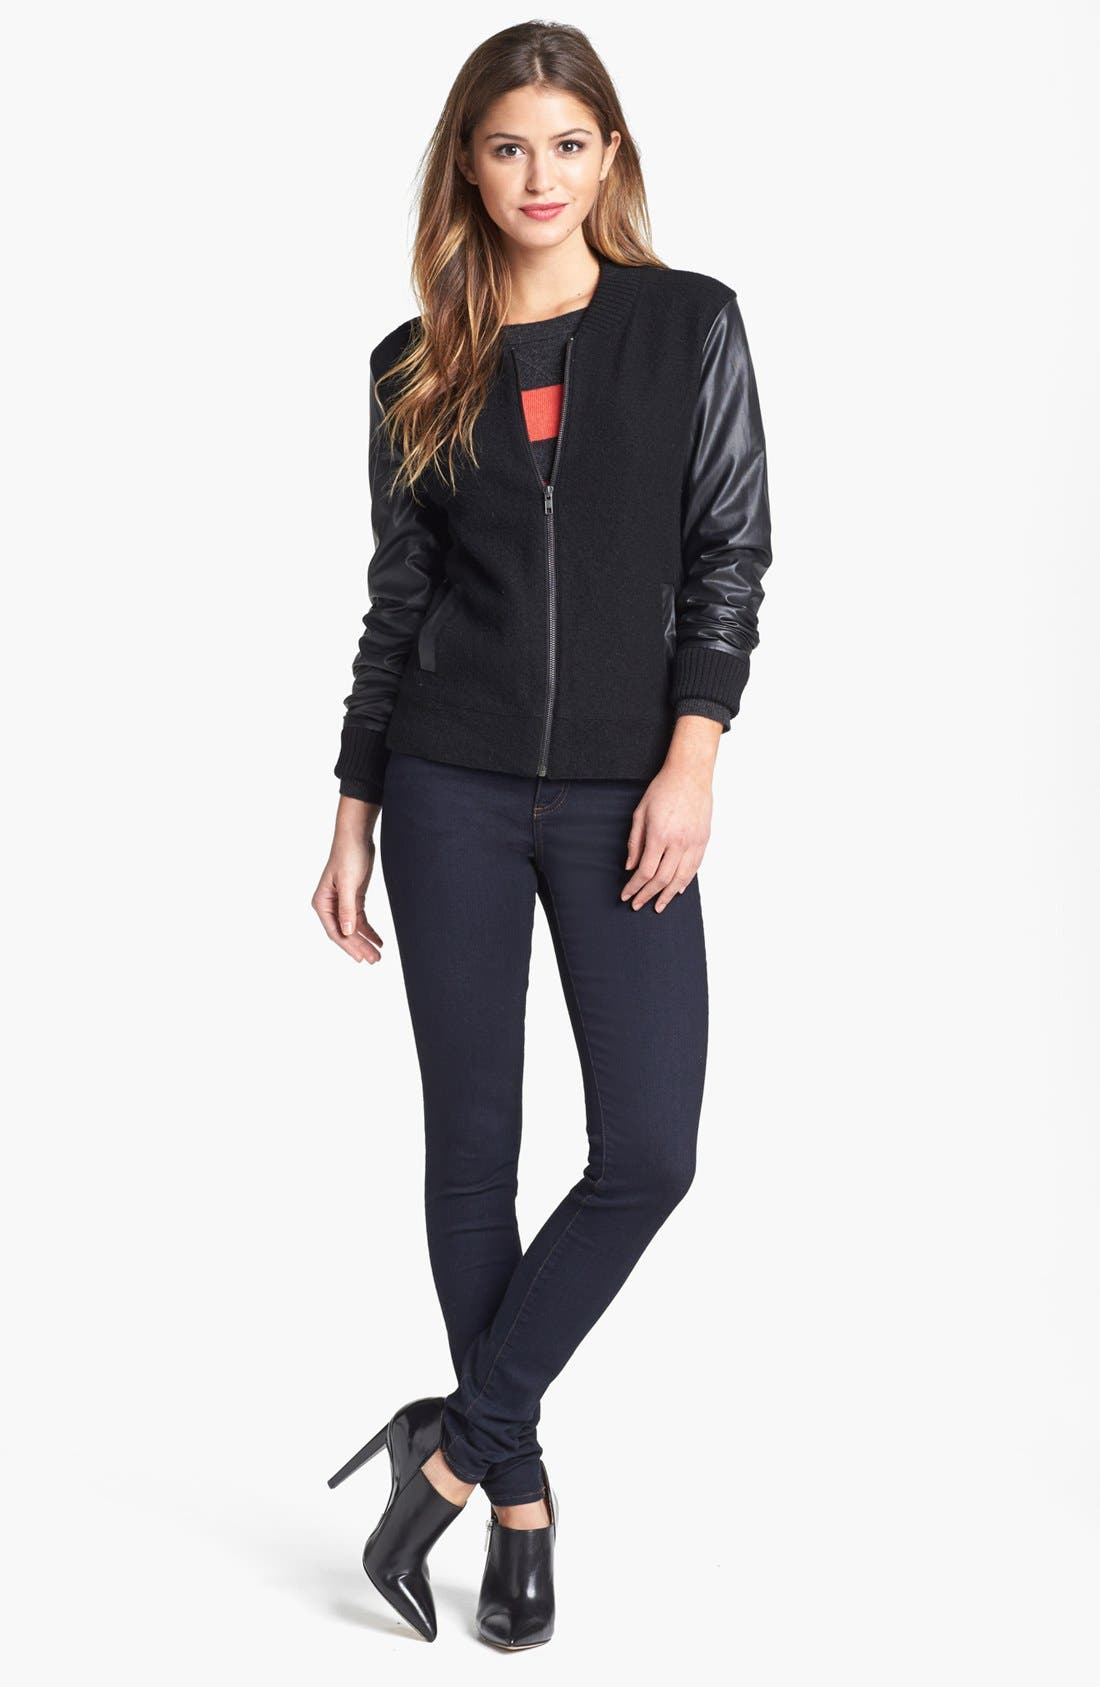 Alternate Image 1 Selected - Halogen® Wool & Faux Leather Jacket (Regular & Petite)